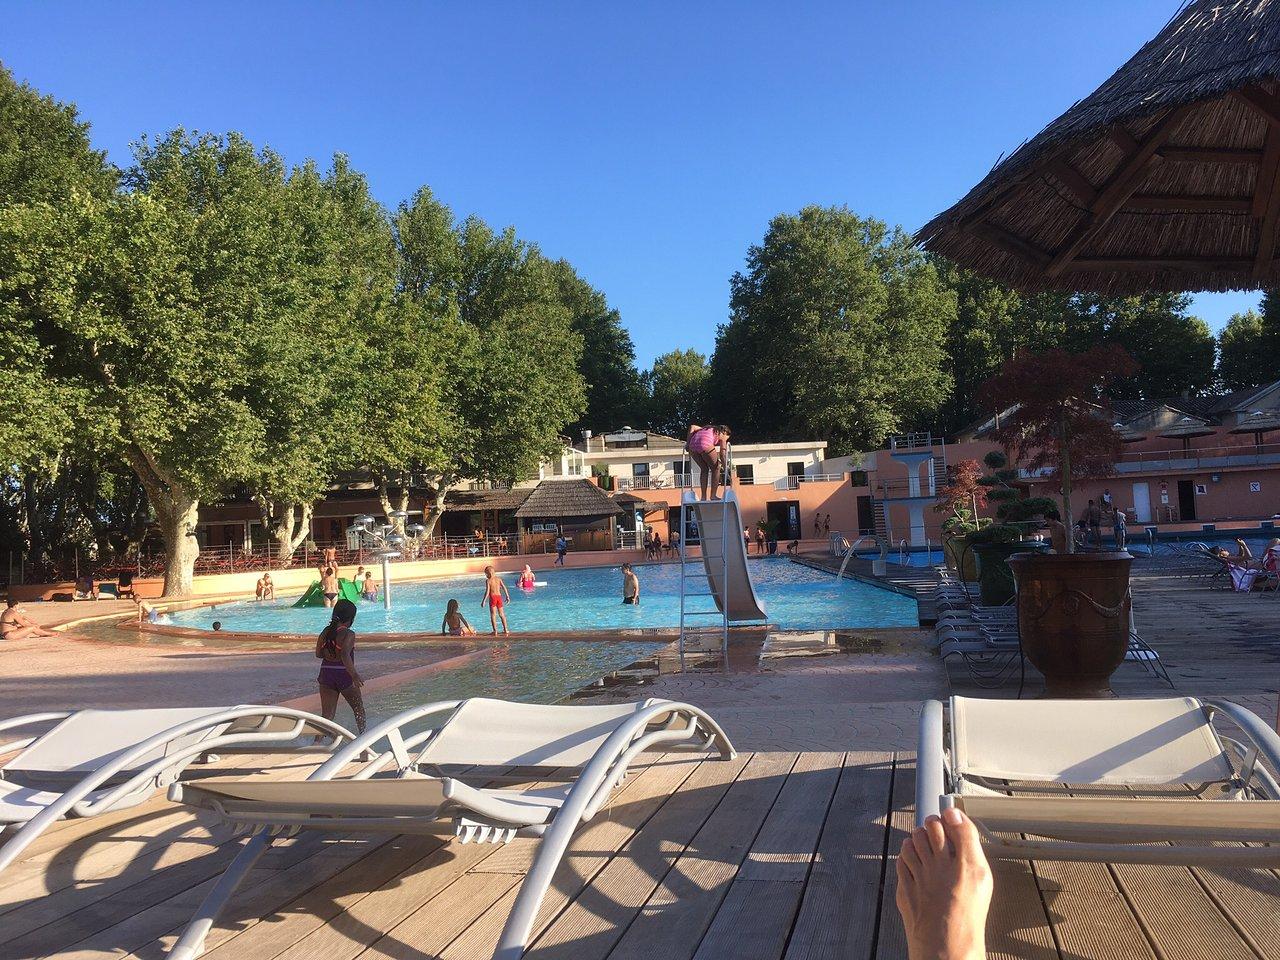 Avis Spa De Nage Clair Azur la palmeraie (avignon) - 2020 all you need to know before